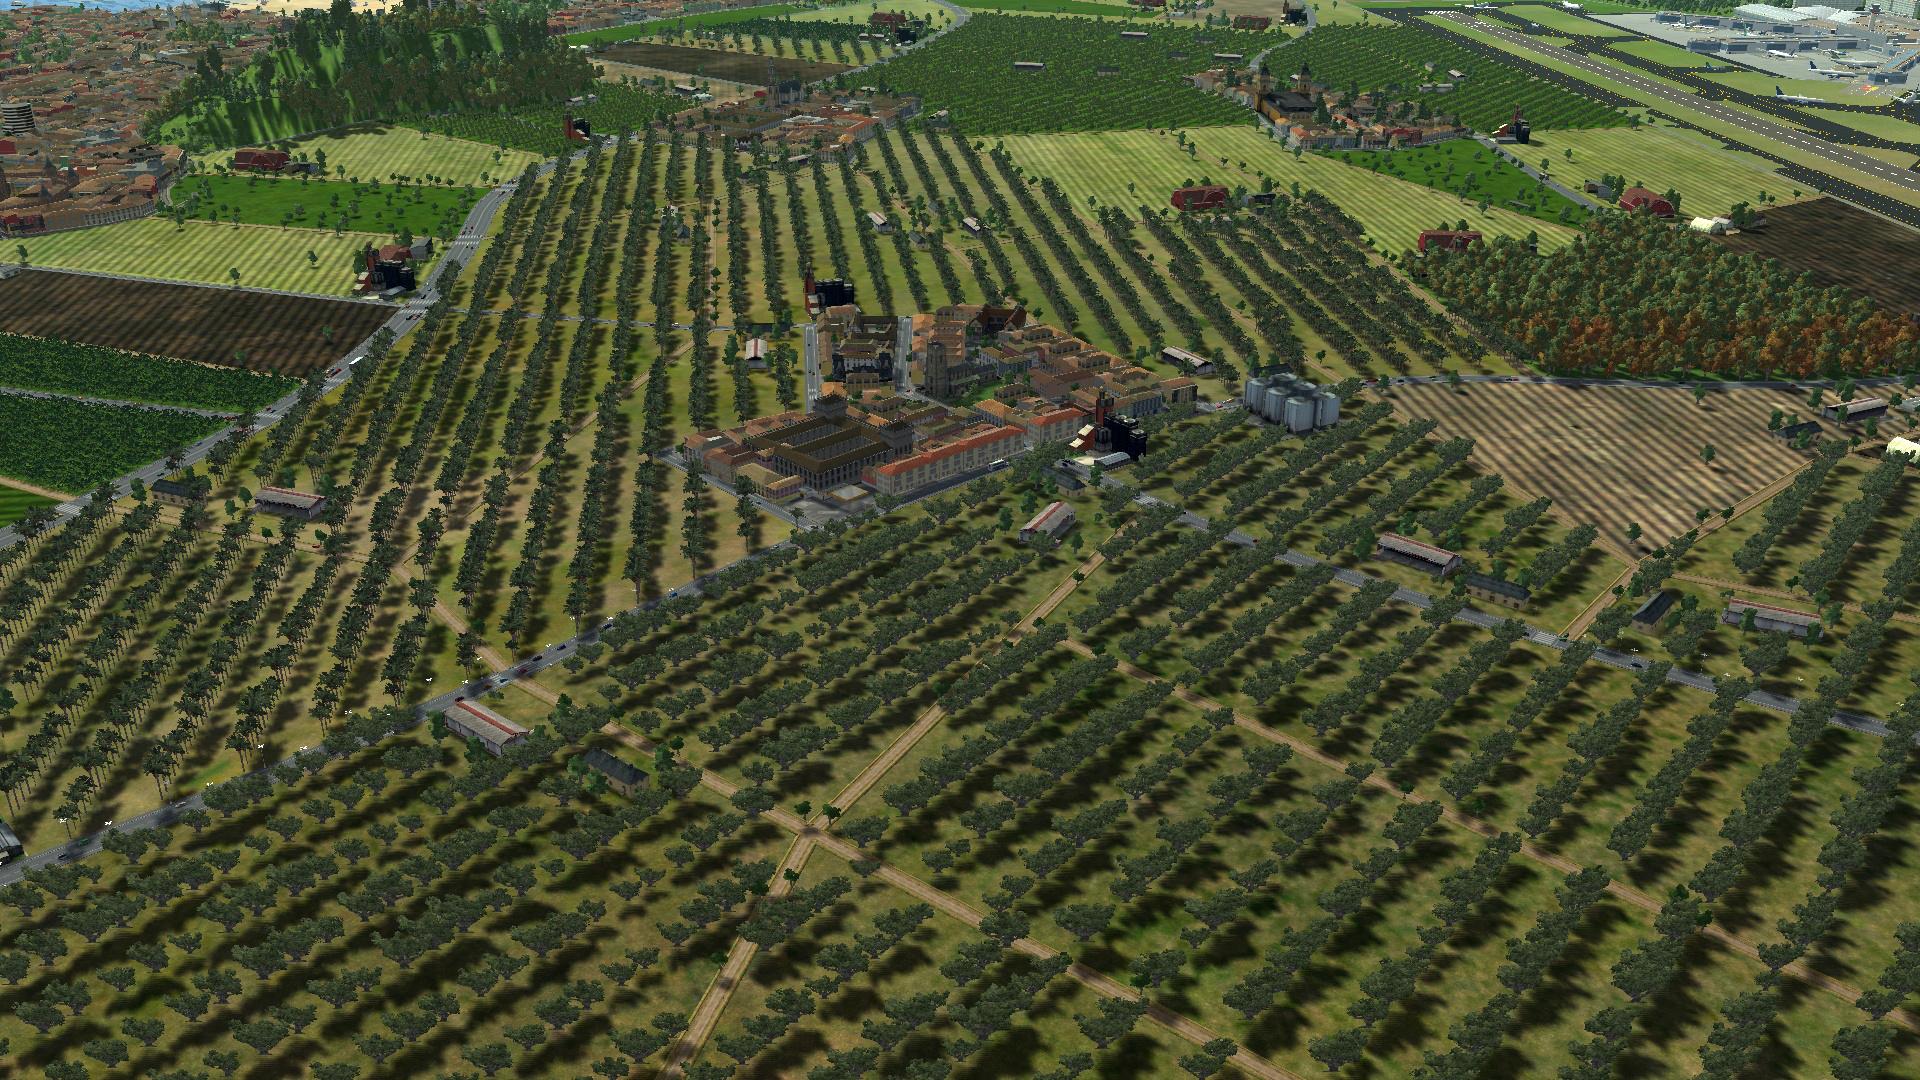 cxl_screenshot_cuva cavelio_Rural_12.jpg